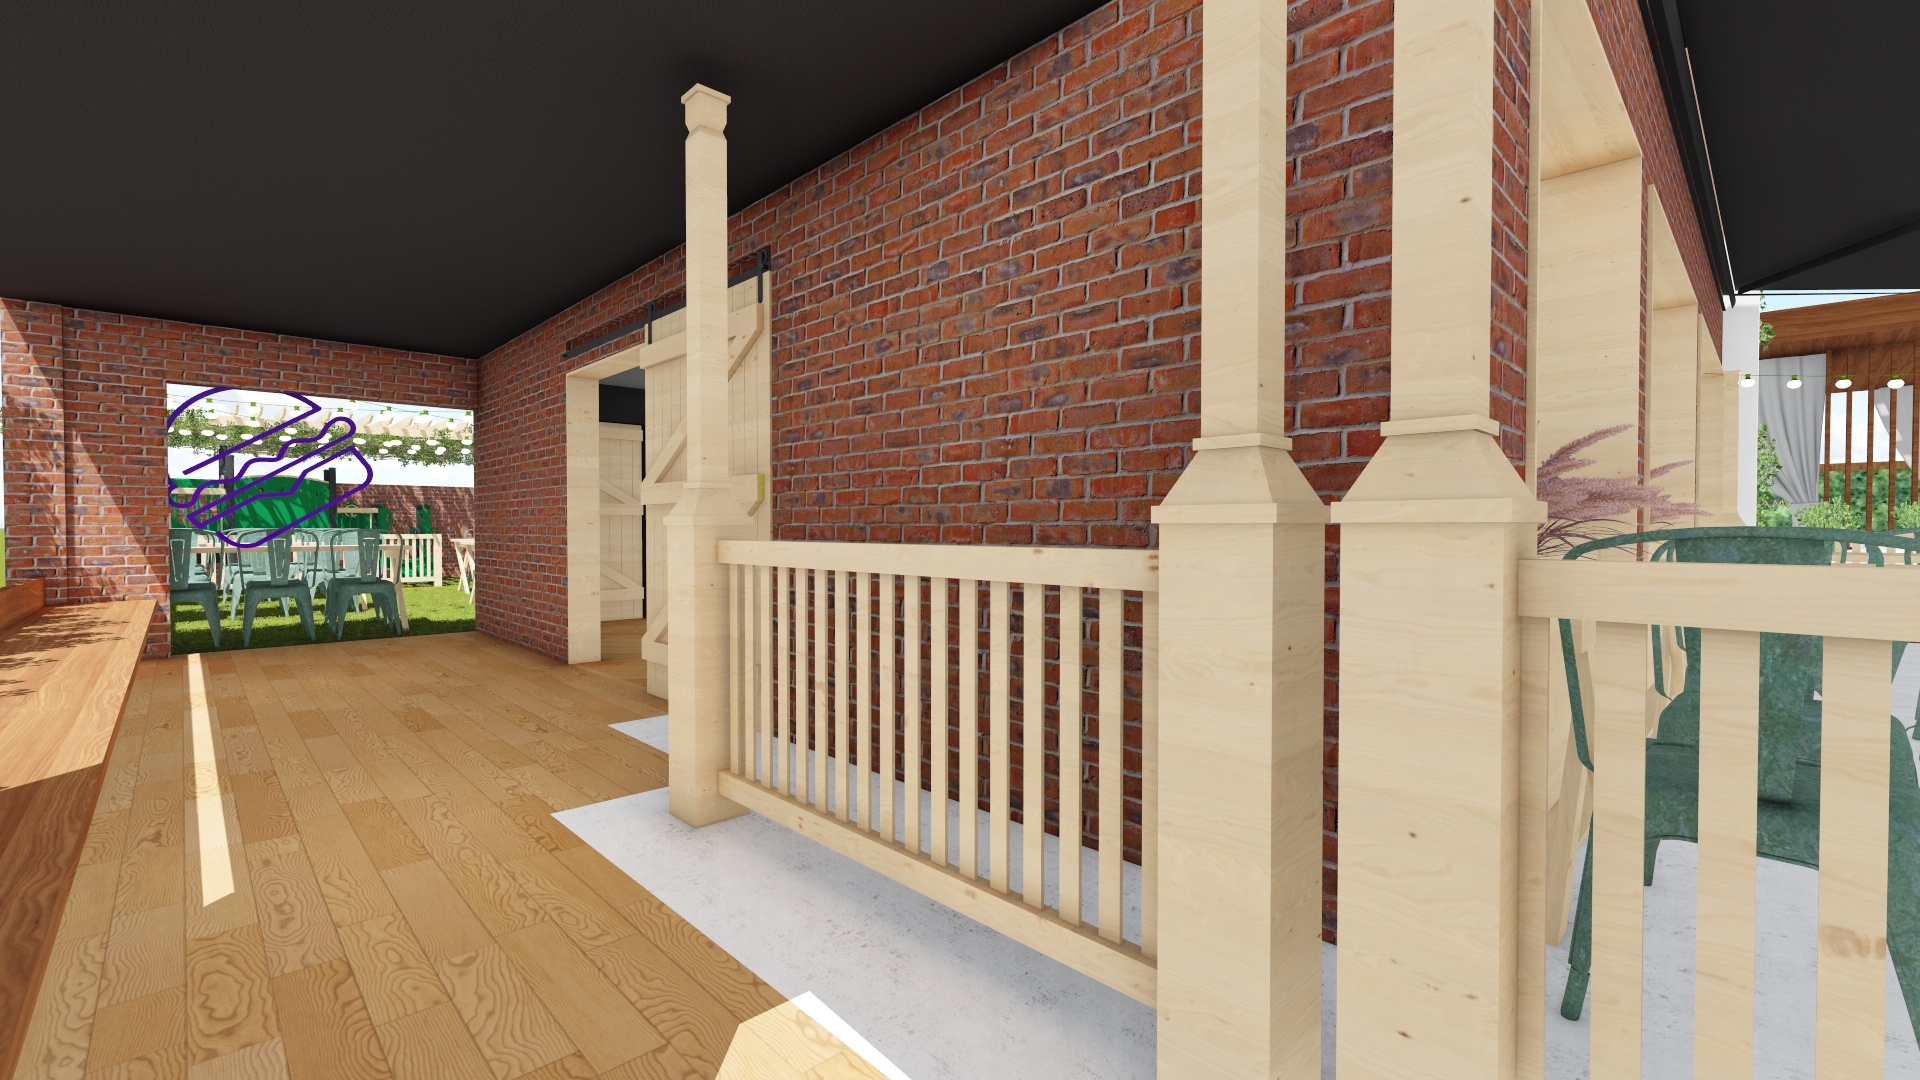 projeto-arquitetonico-fivebok-duo-arquitetura-06.jpg